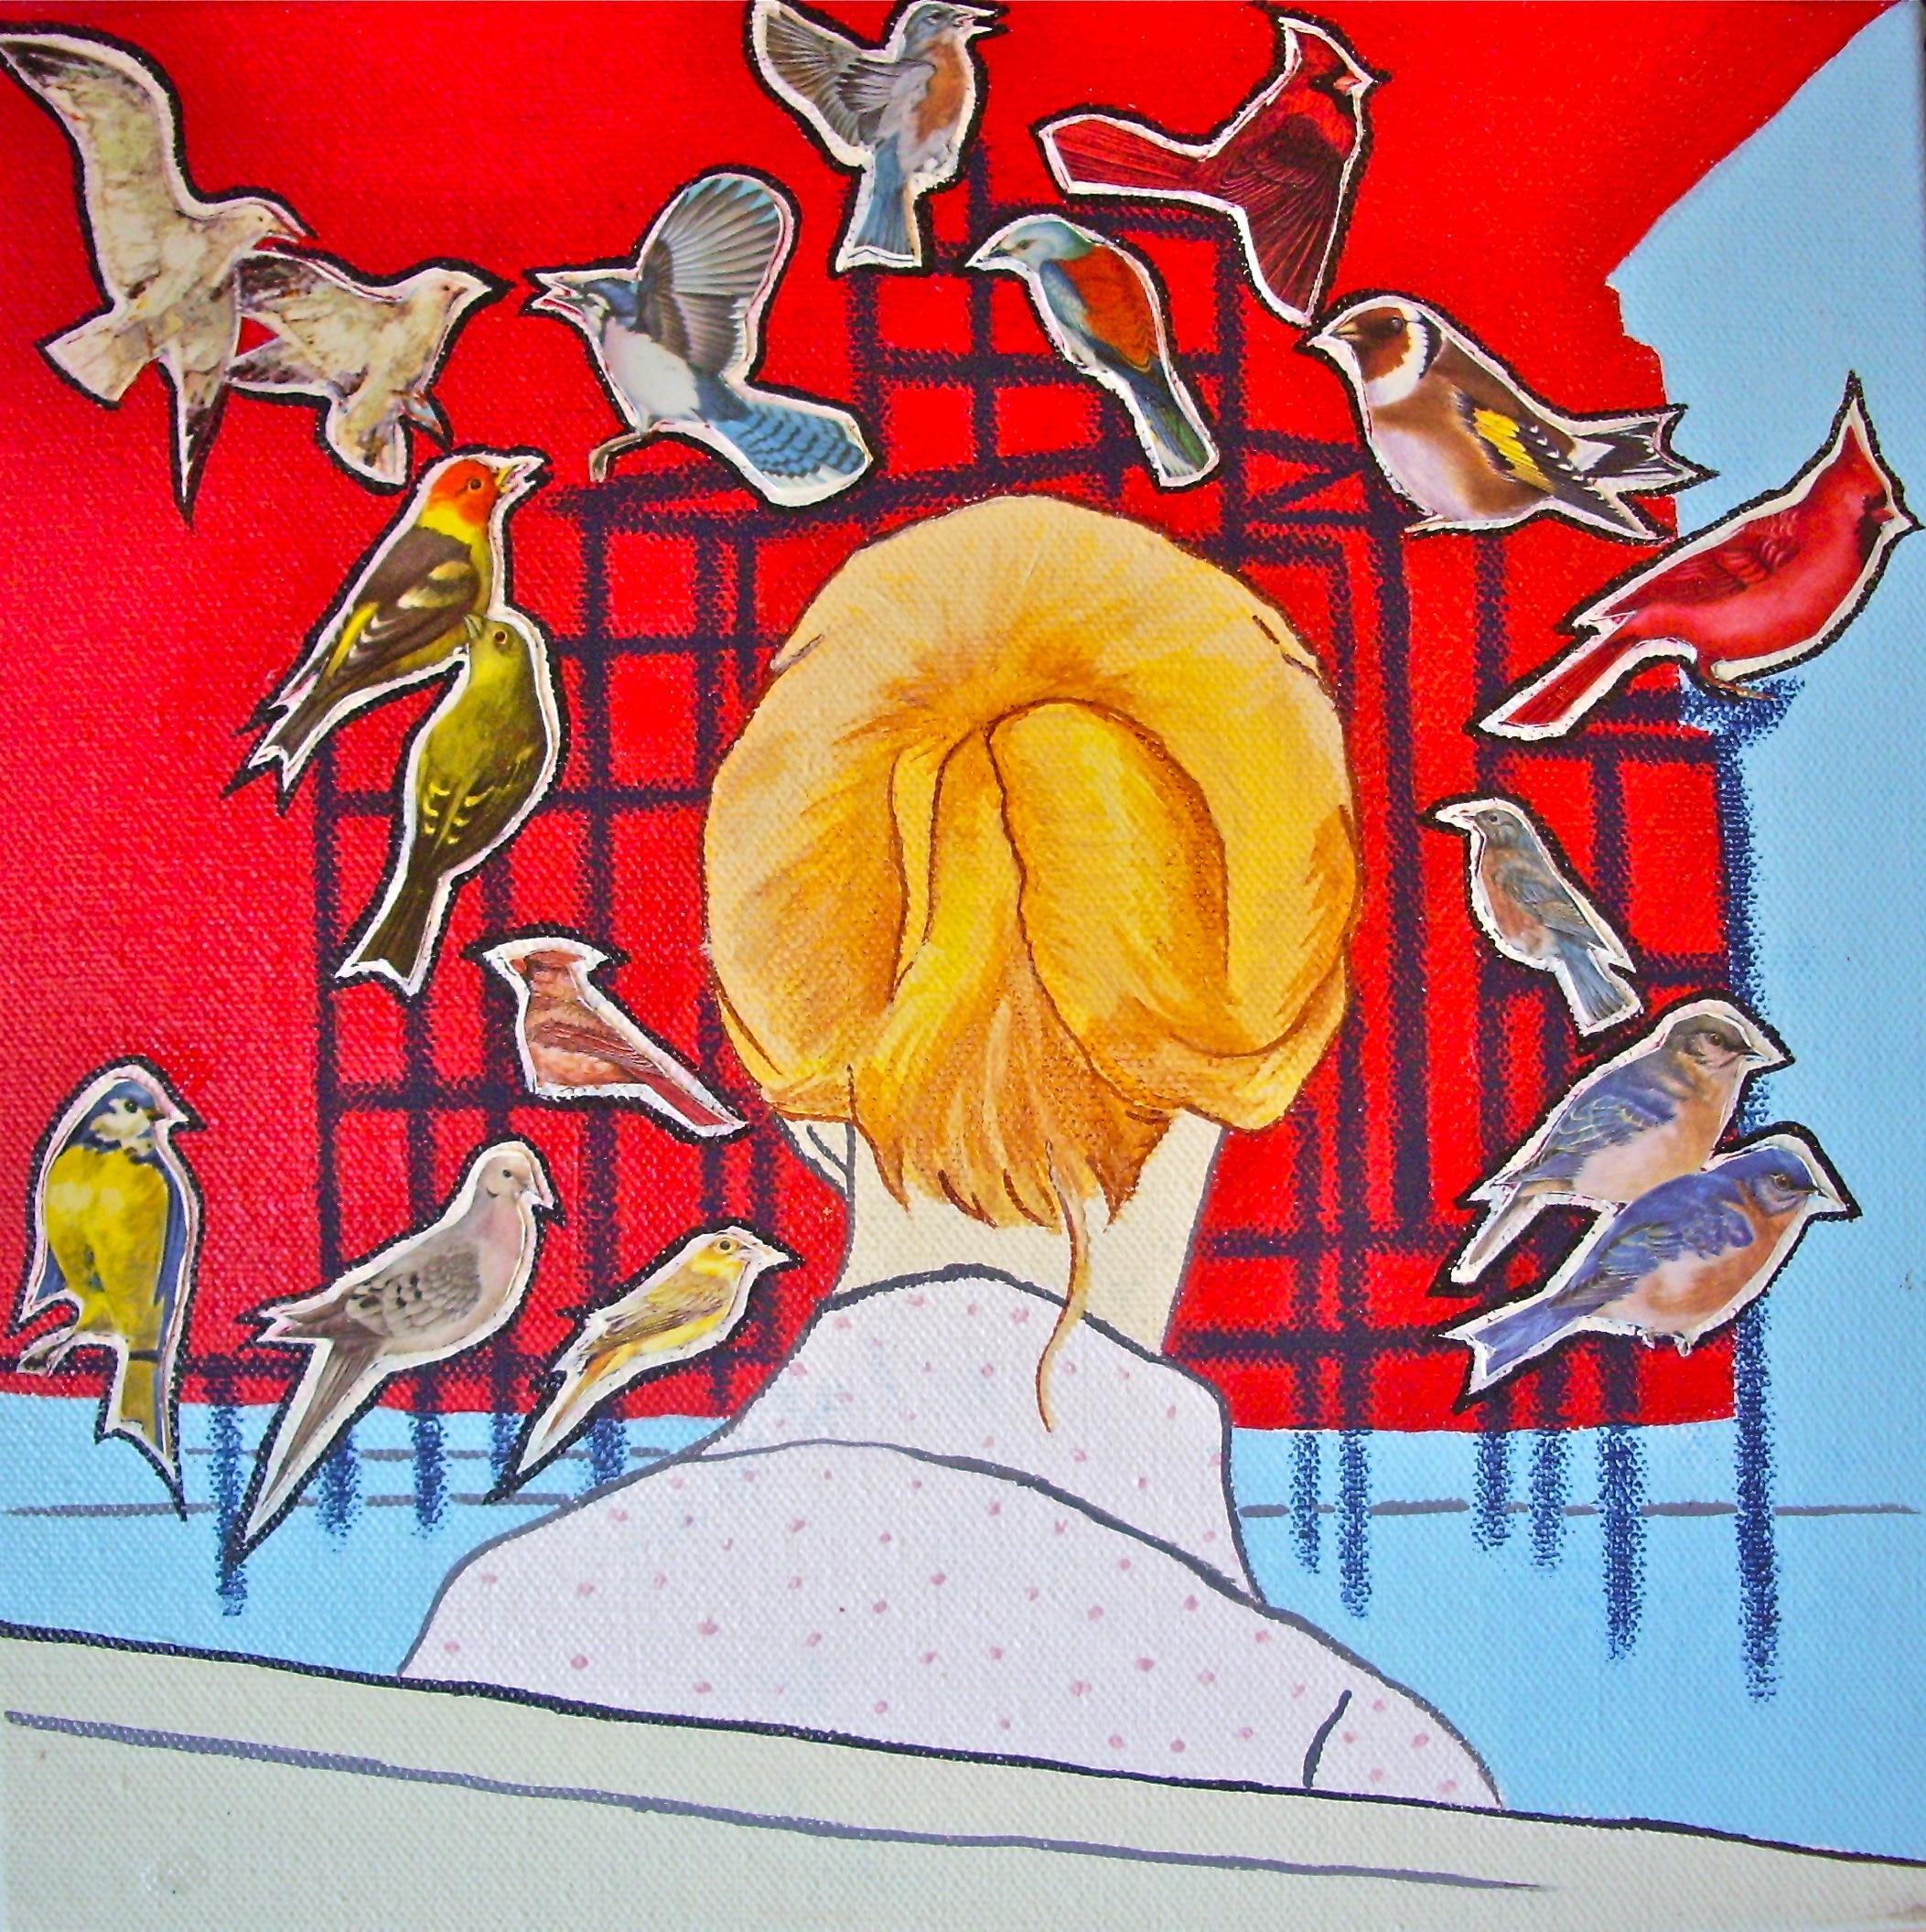 Tipi Hates Birds